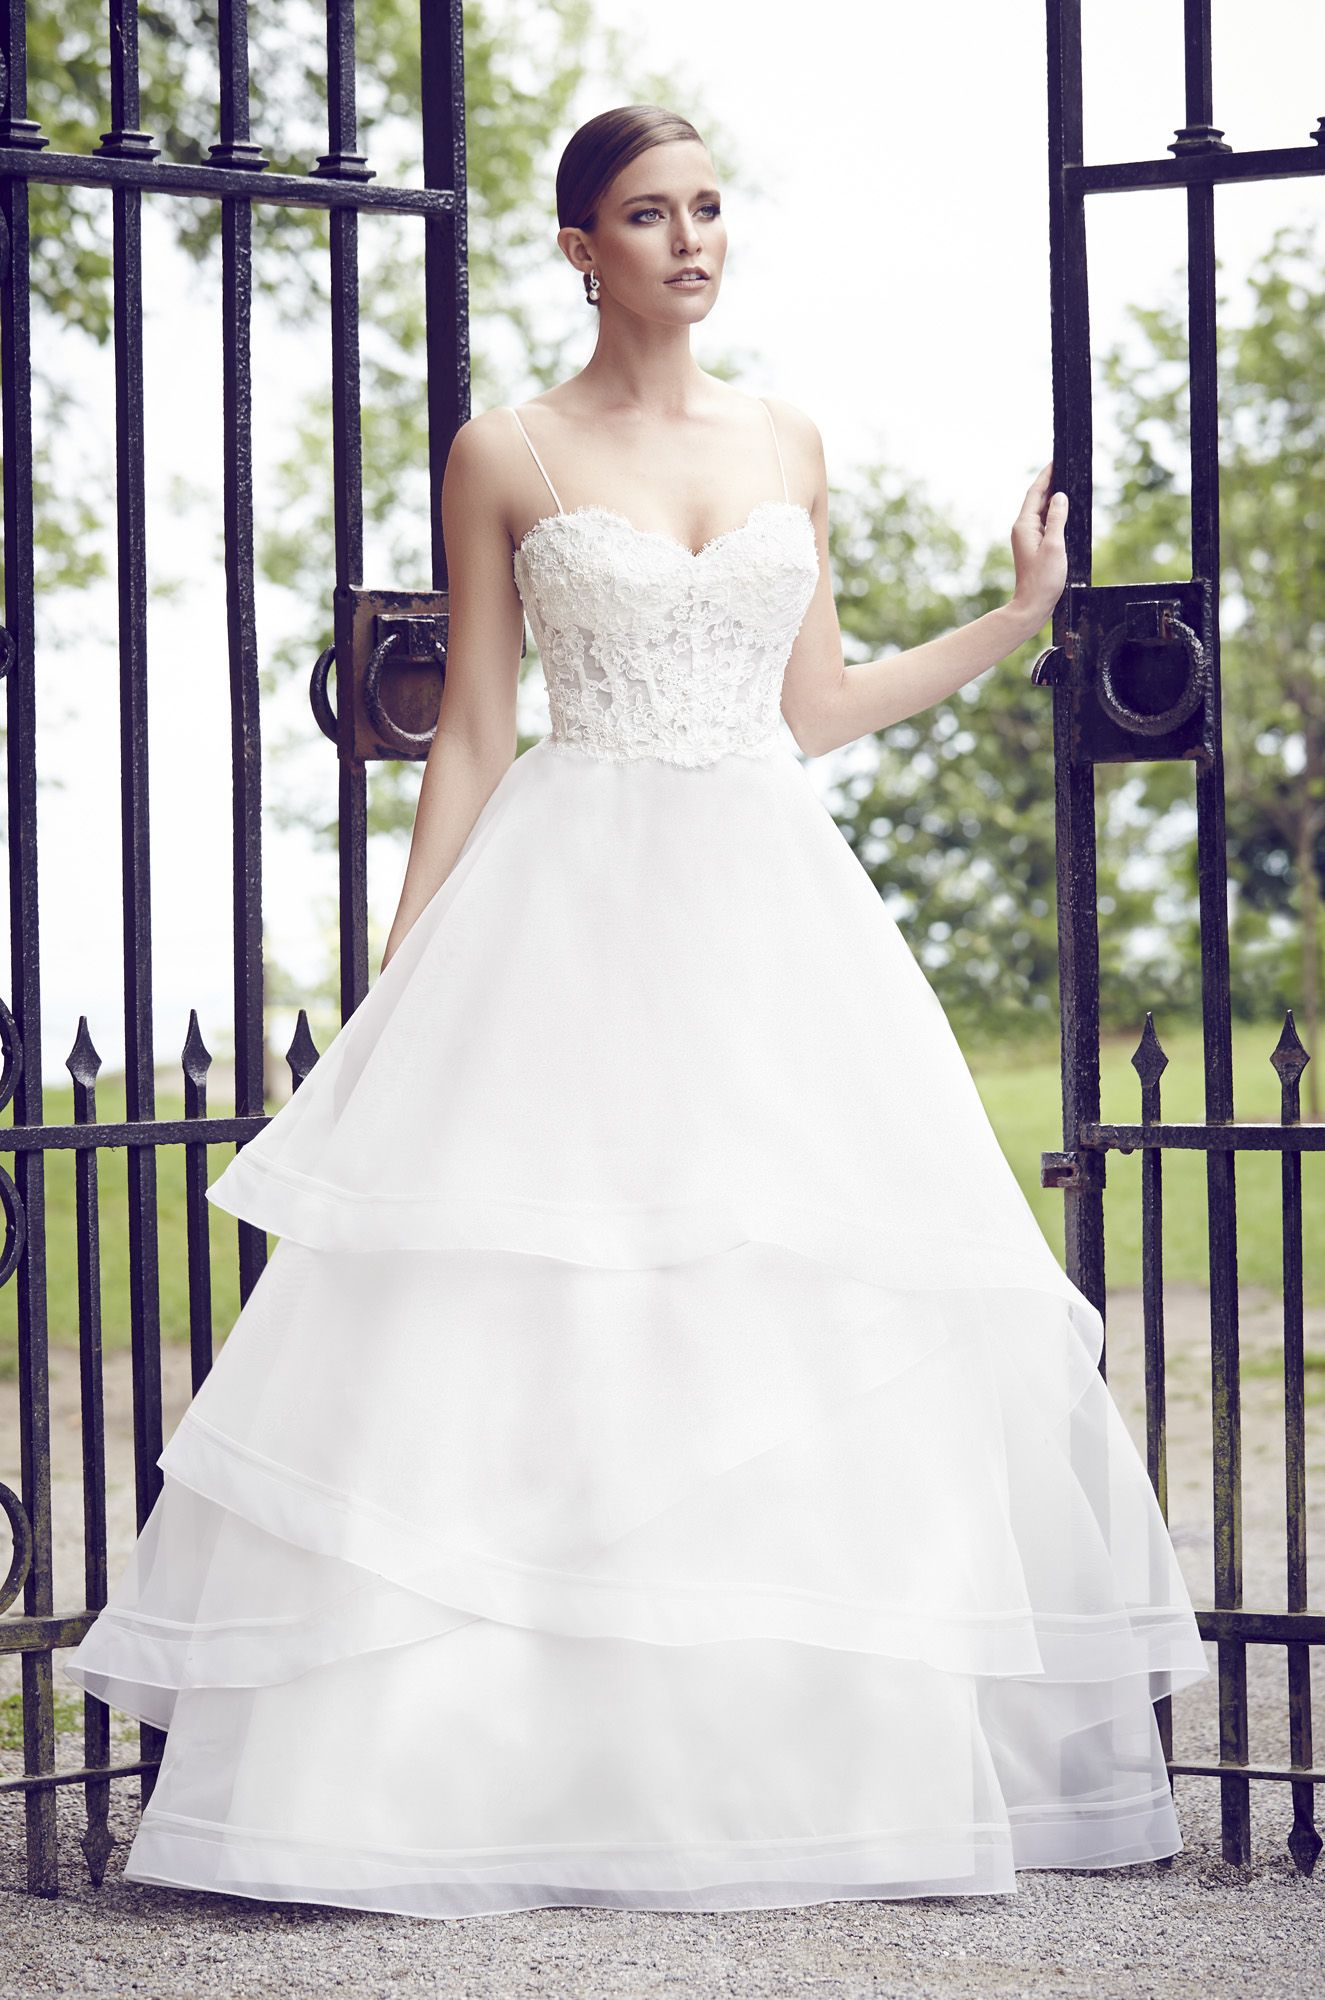 Paloma blanca gowns in jacksonville pinterest paloma